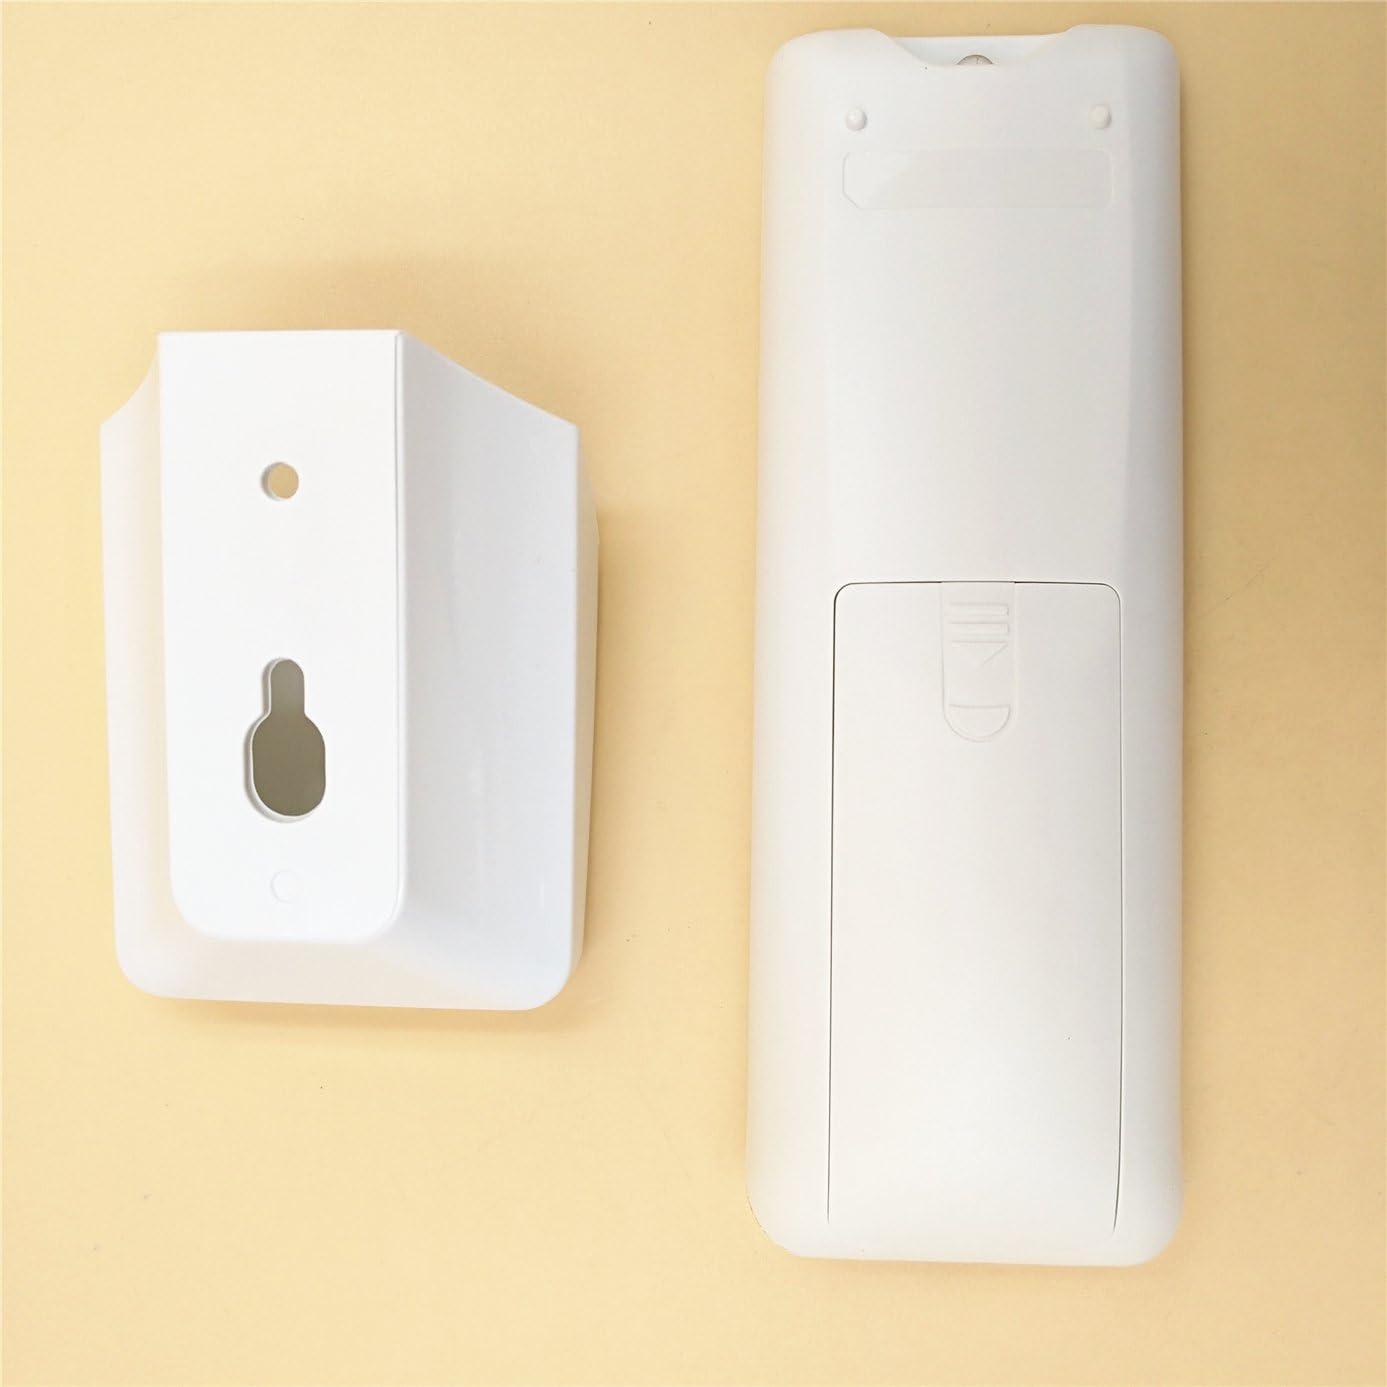 G/én/érique Neuf t/él/écommande pour Beko//Haier Air Conditioner Bxeu120/Bxeu121/faciles /à Yl-hd04/Yr-hd01/Yr-hd06/Yl-hd02